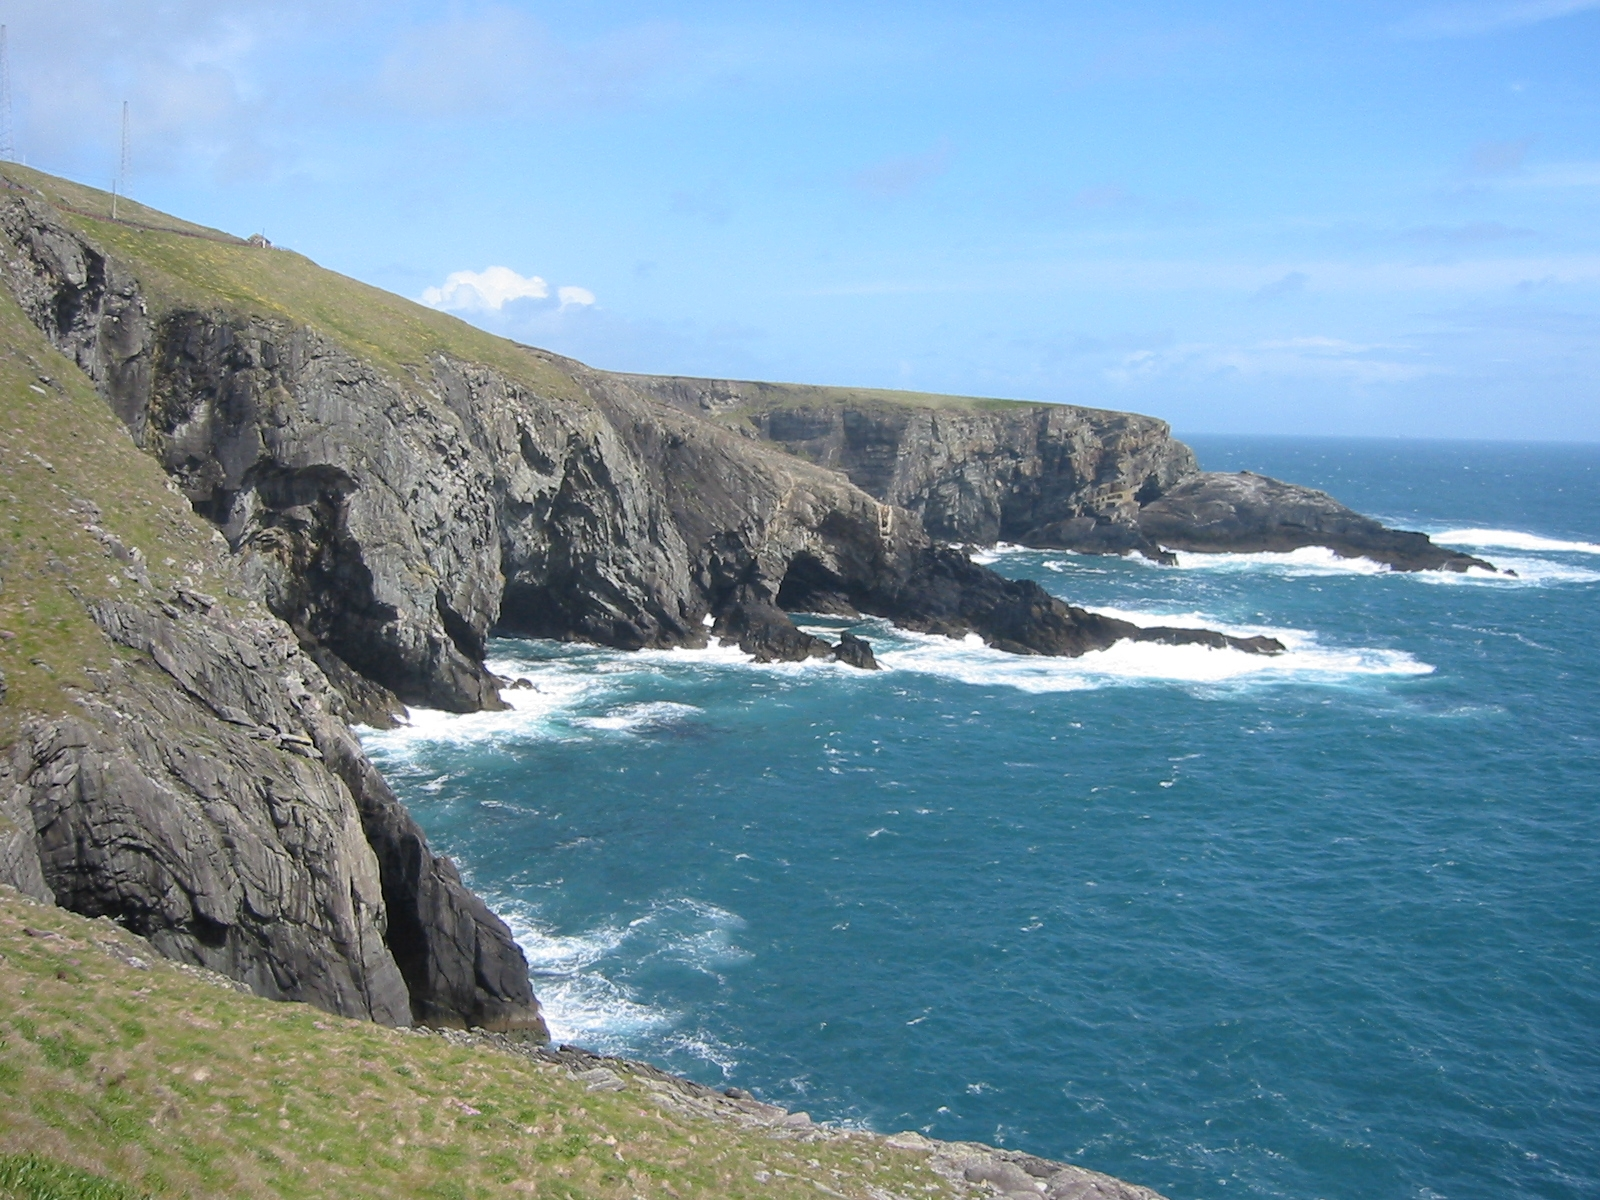 Dingle Peninsula, County Kerry, Ireland скачать